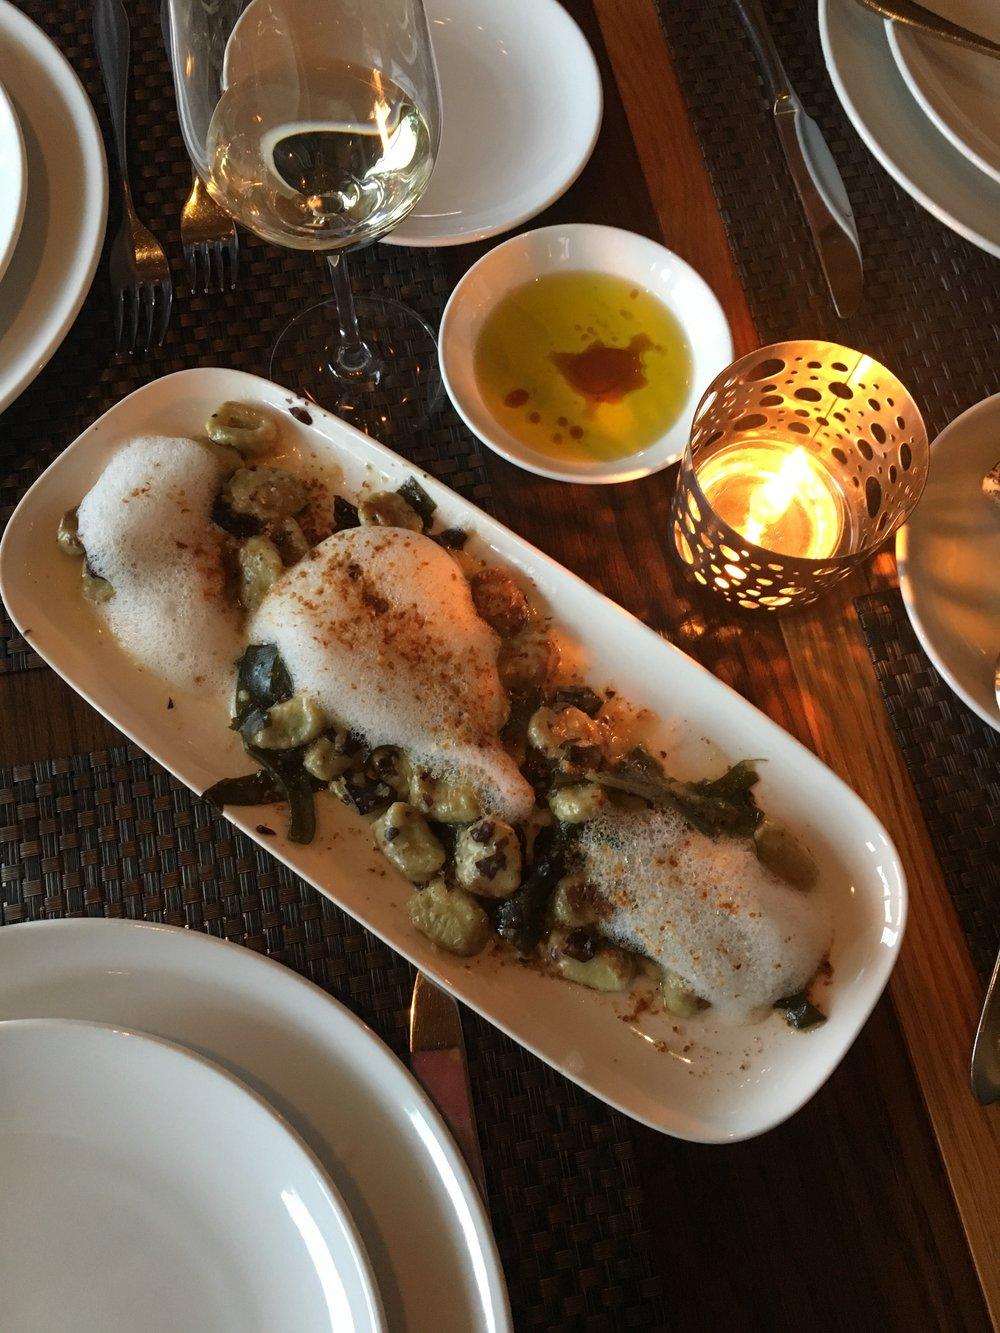 Oyster Foam Gnocchi from Miradoro